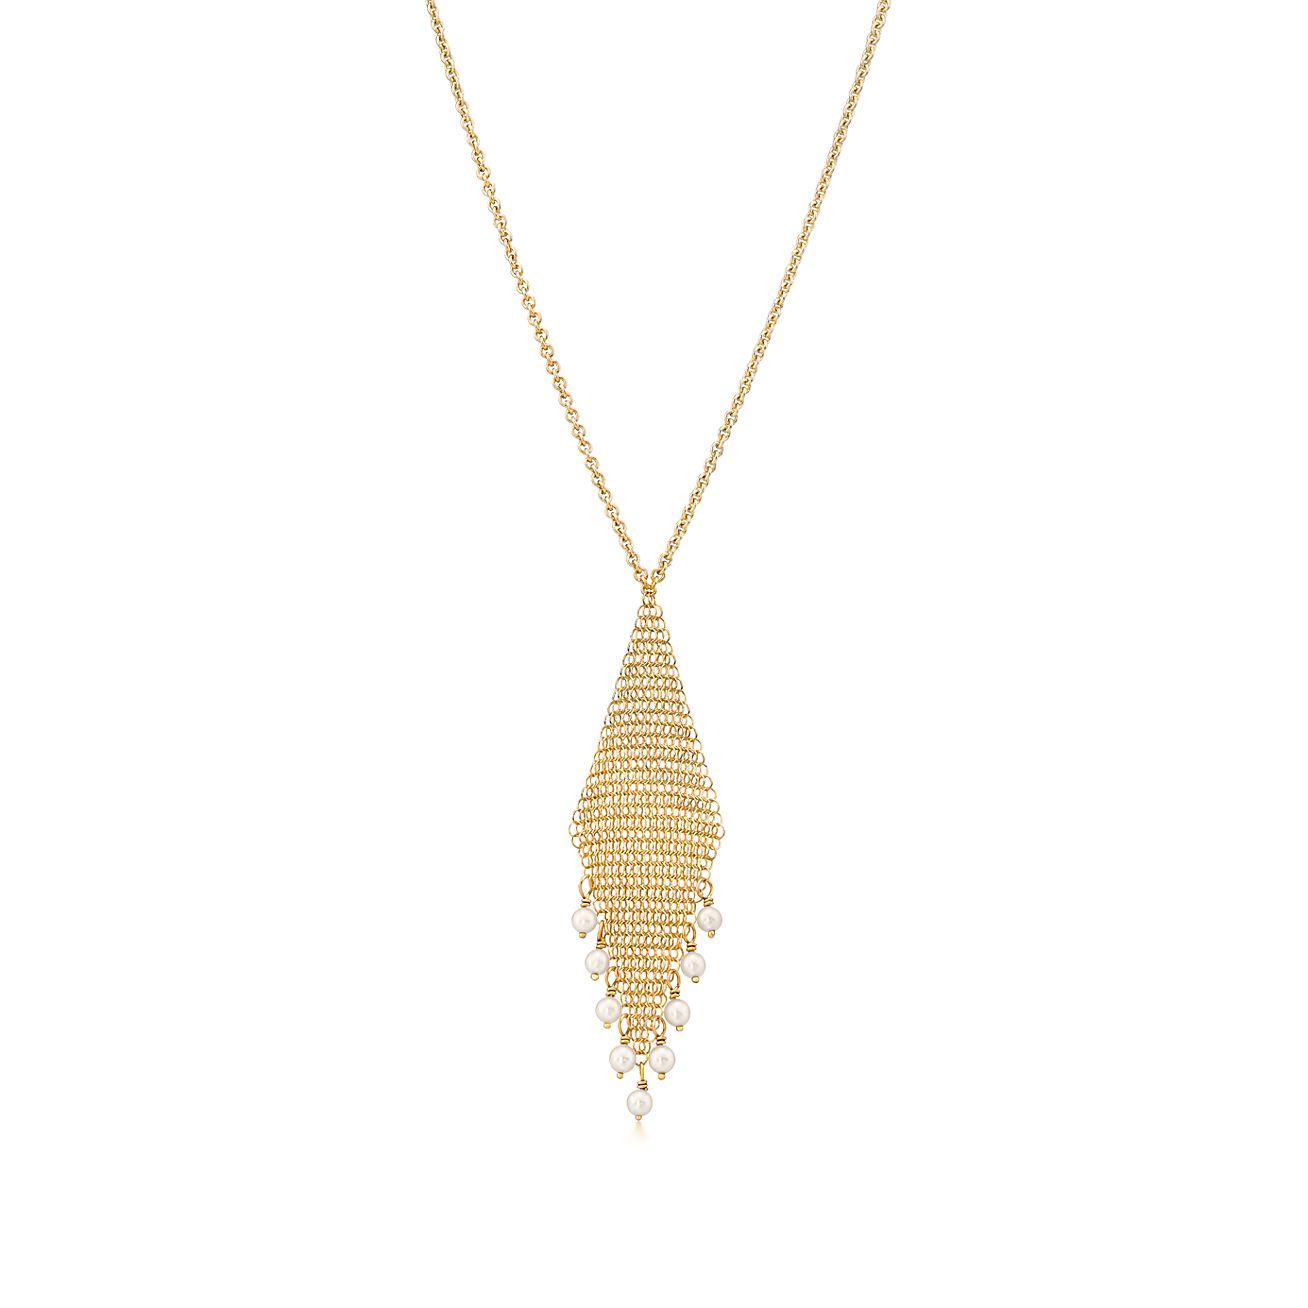 Elsa Peretti Mesh fringe earrings in 18k gold with freshwater pearls Tiffany & Co.